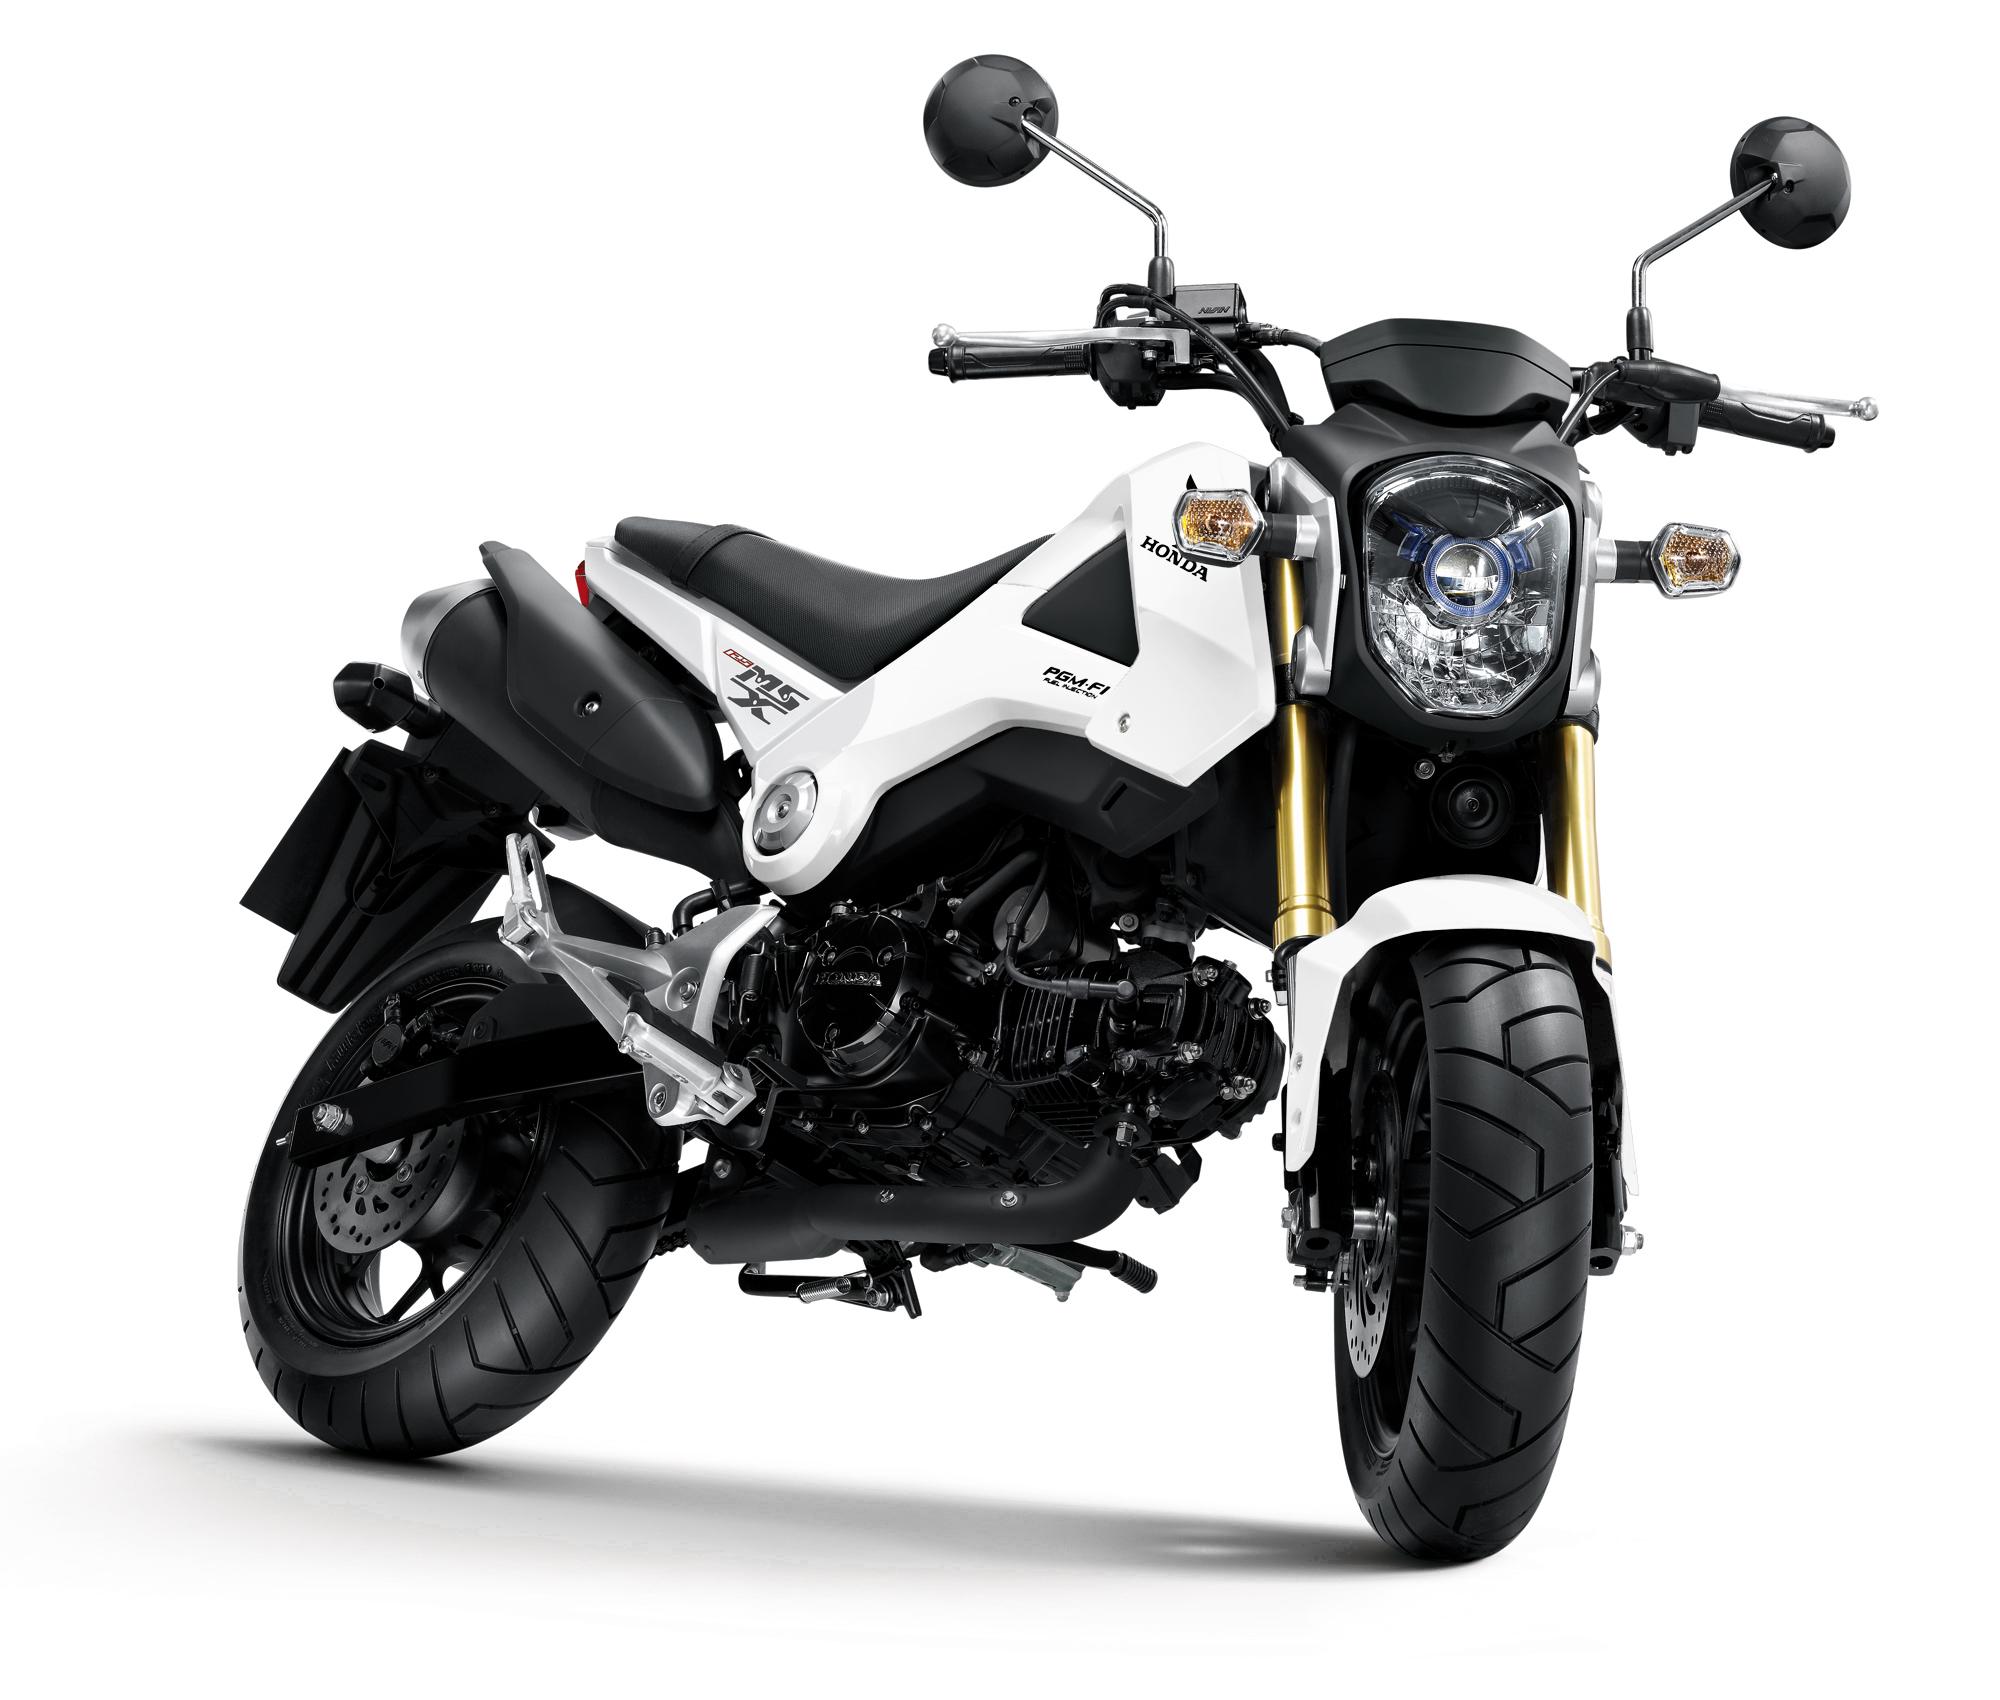 Surprise new mini-bike from Honda